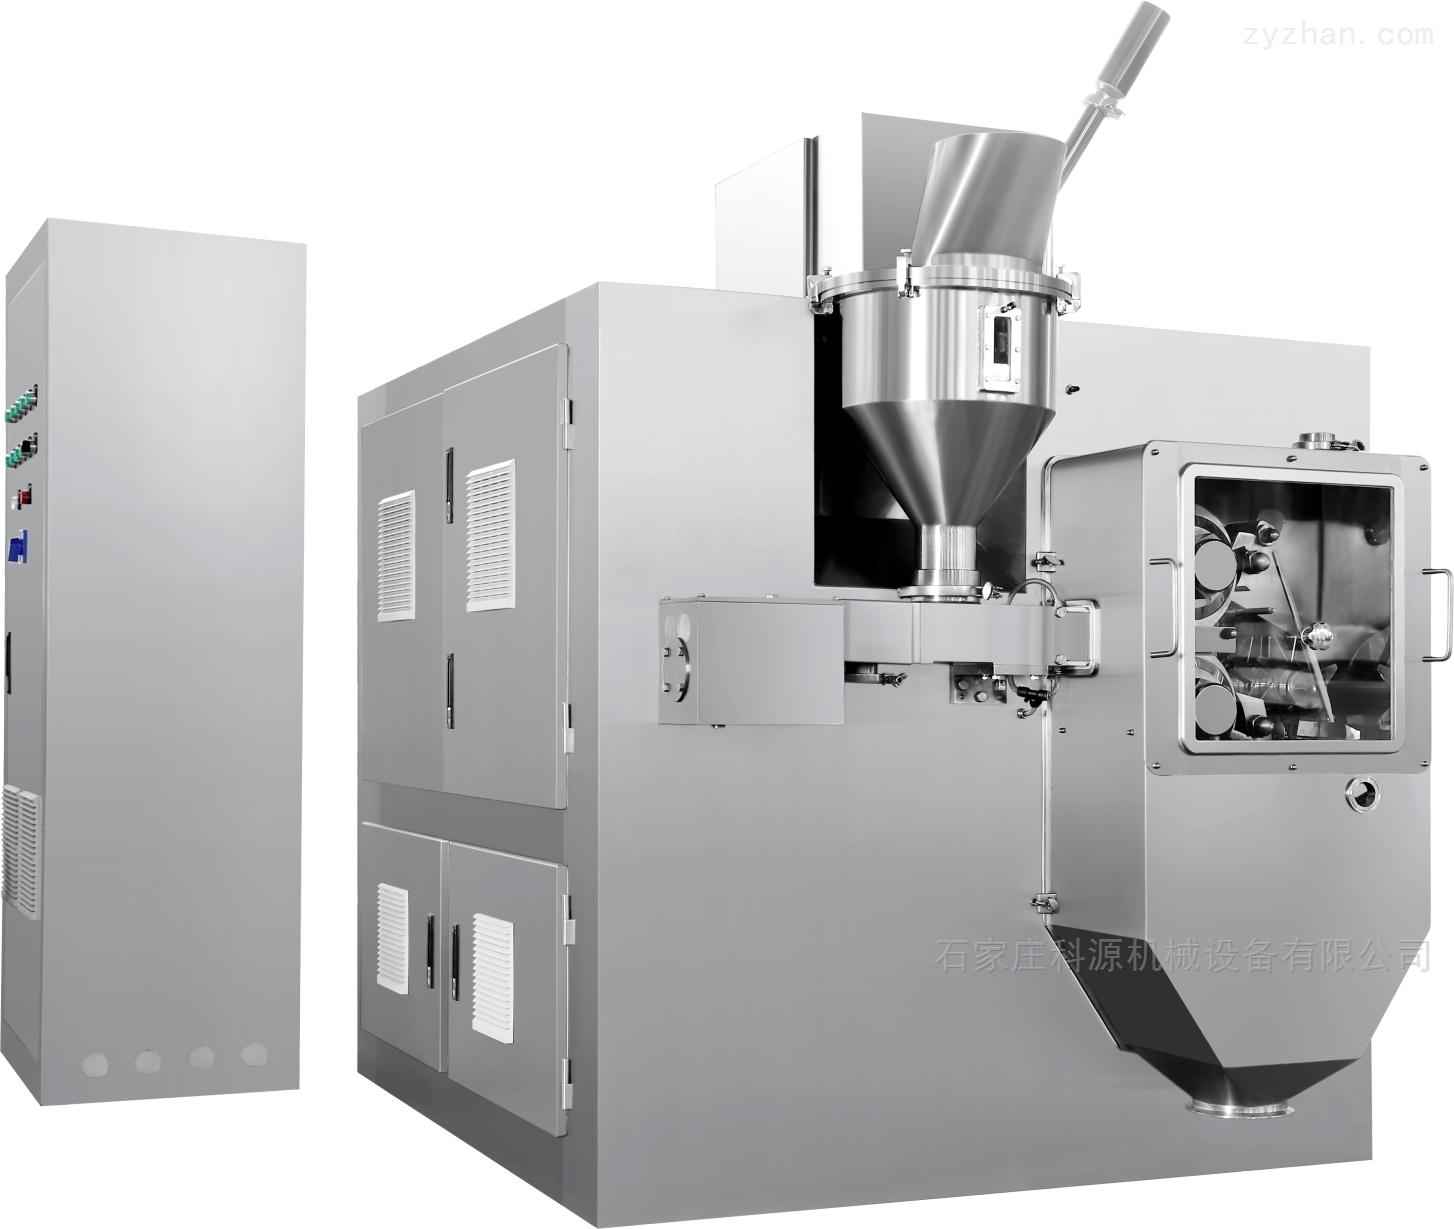 GZL240-100L型干法制粒机